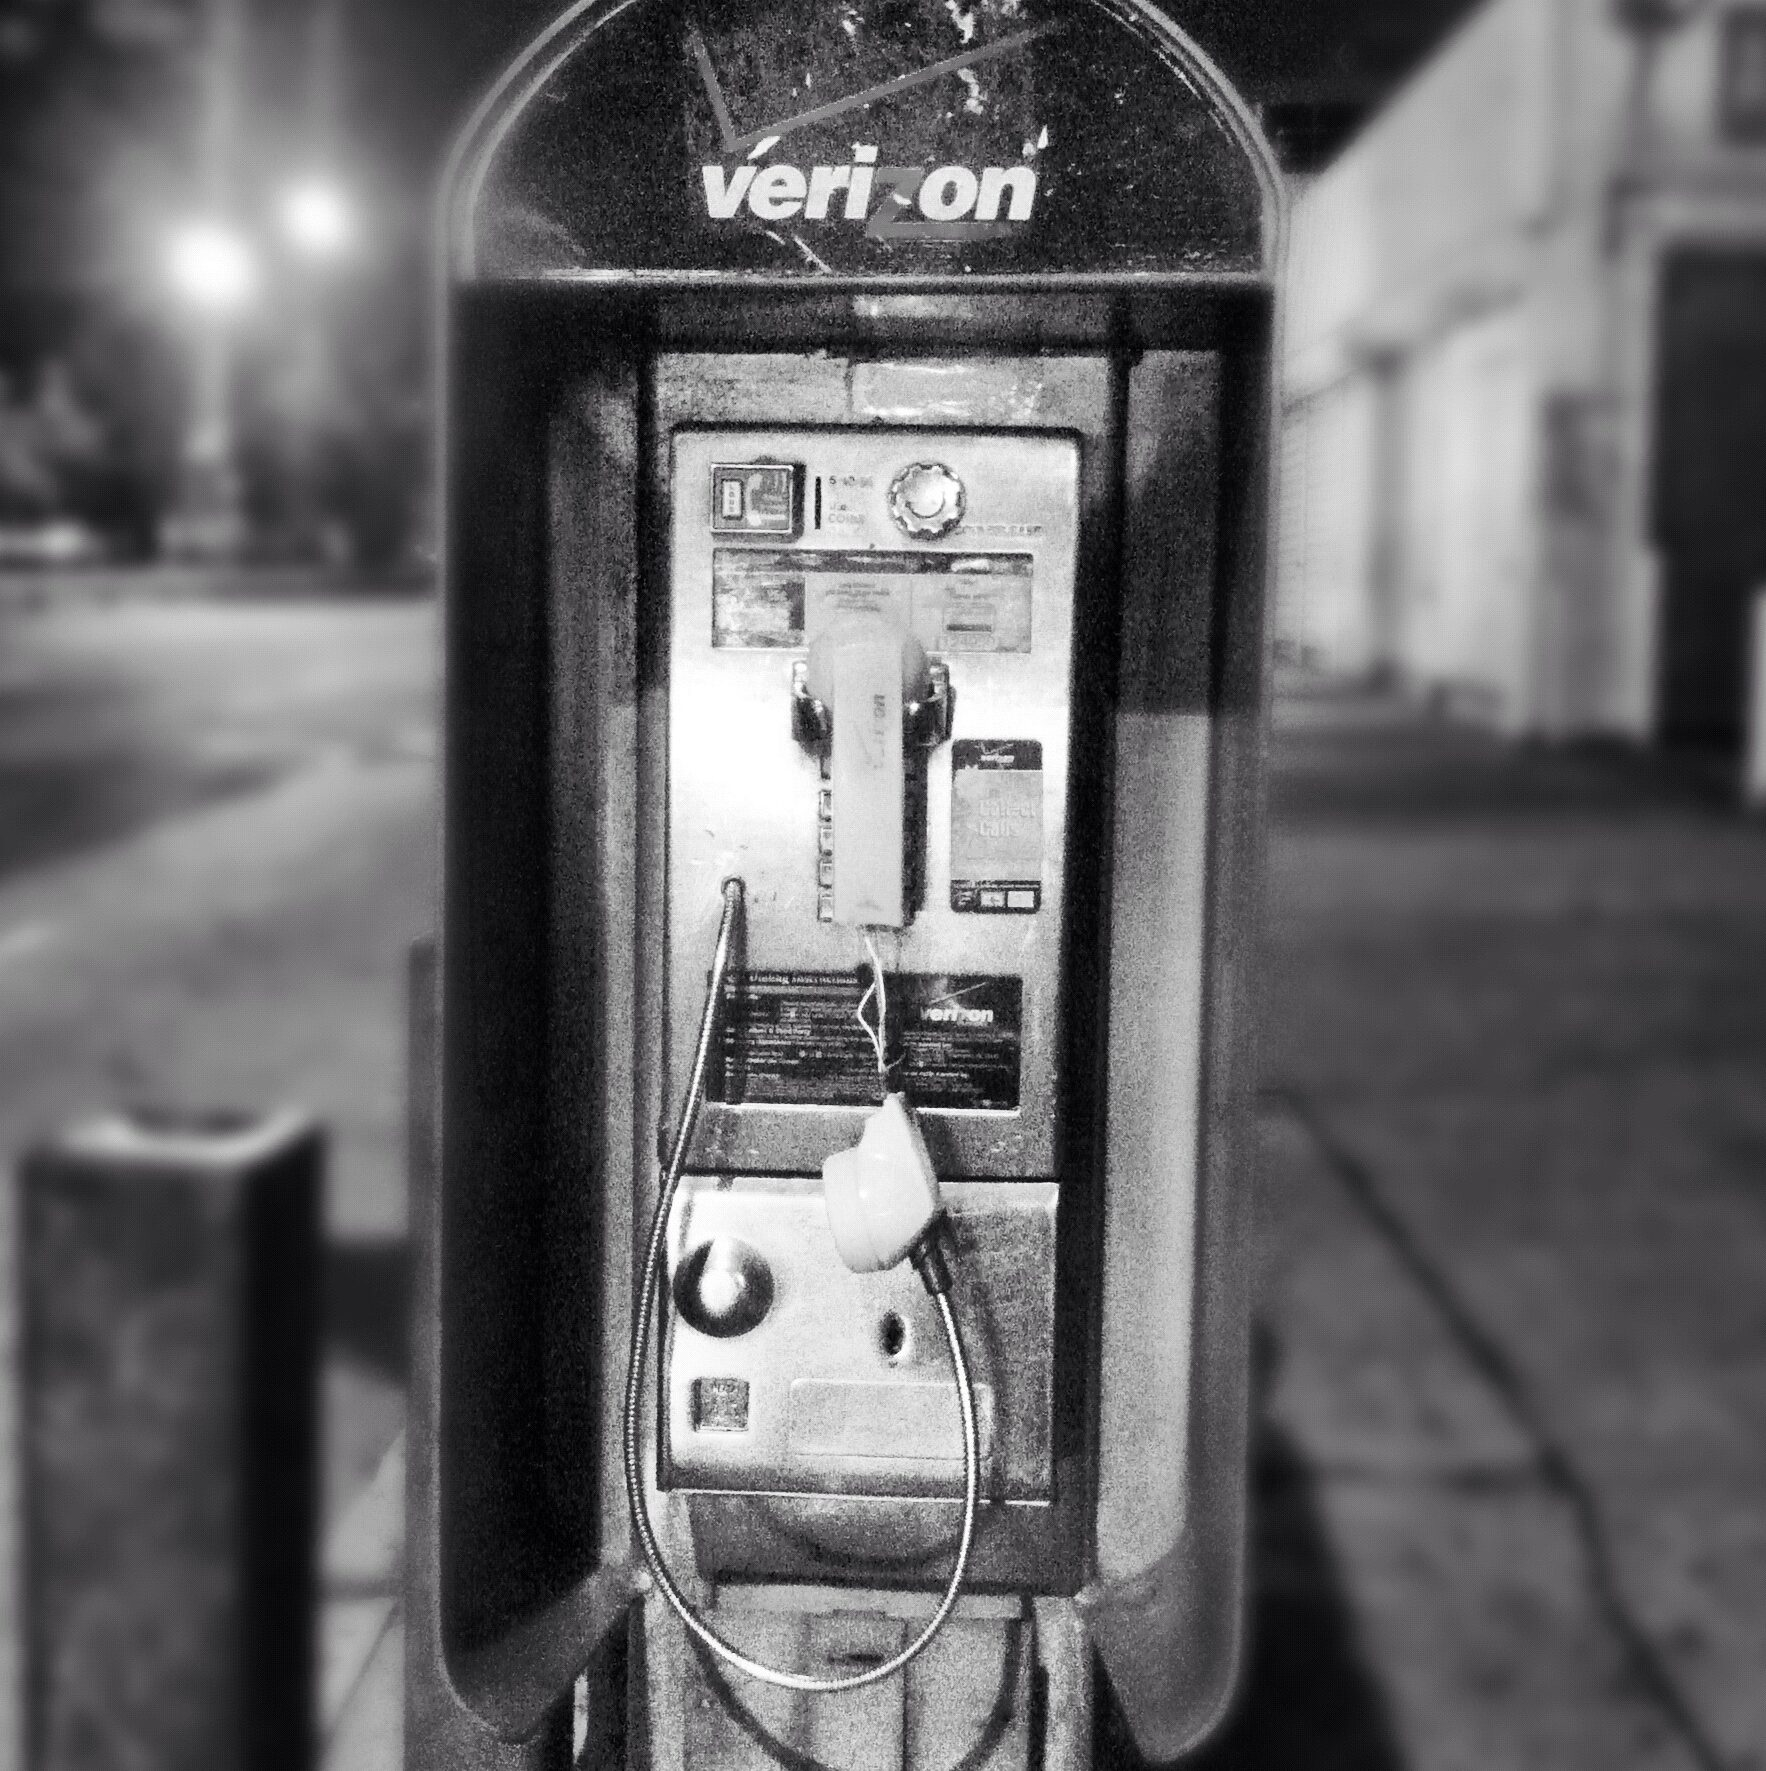 phone booth nueva york